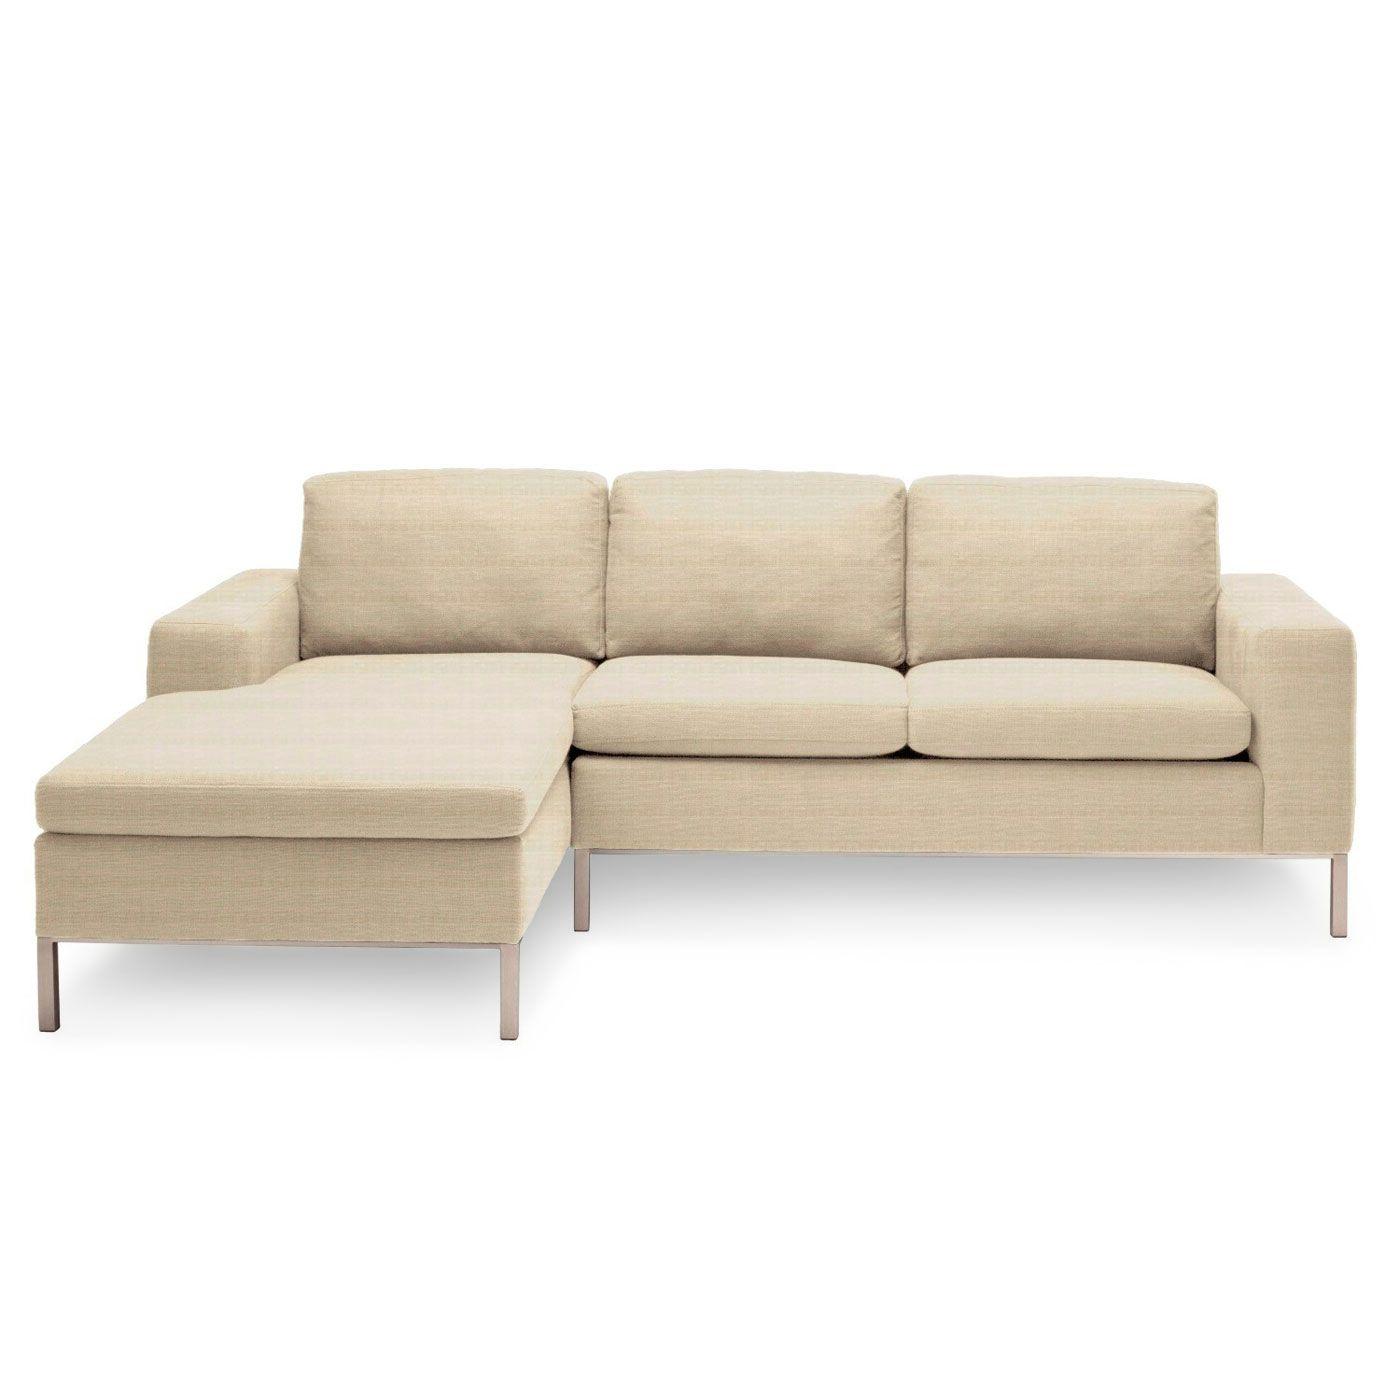 Modern furniture outlet contemporary furniture sale blu dot